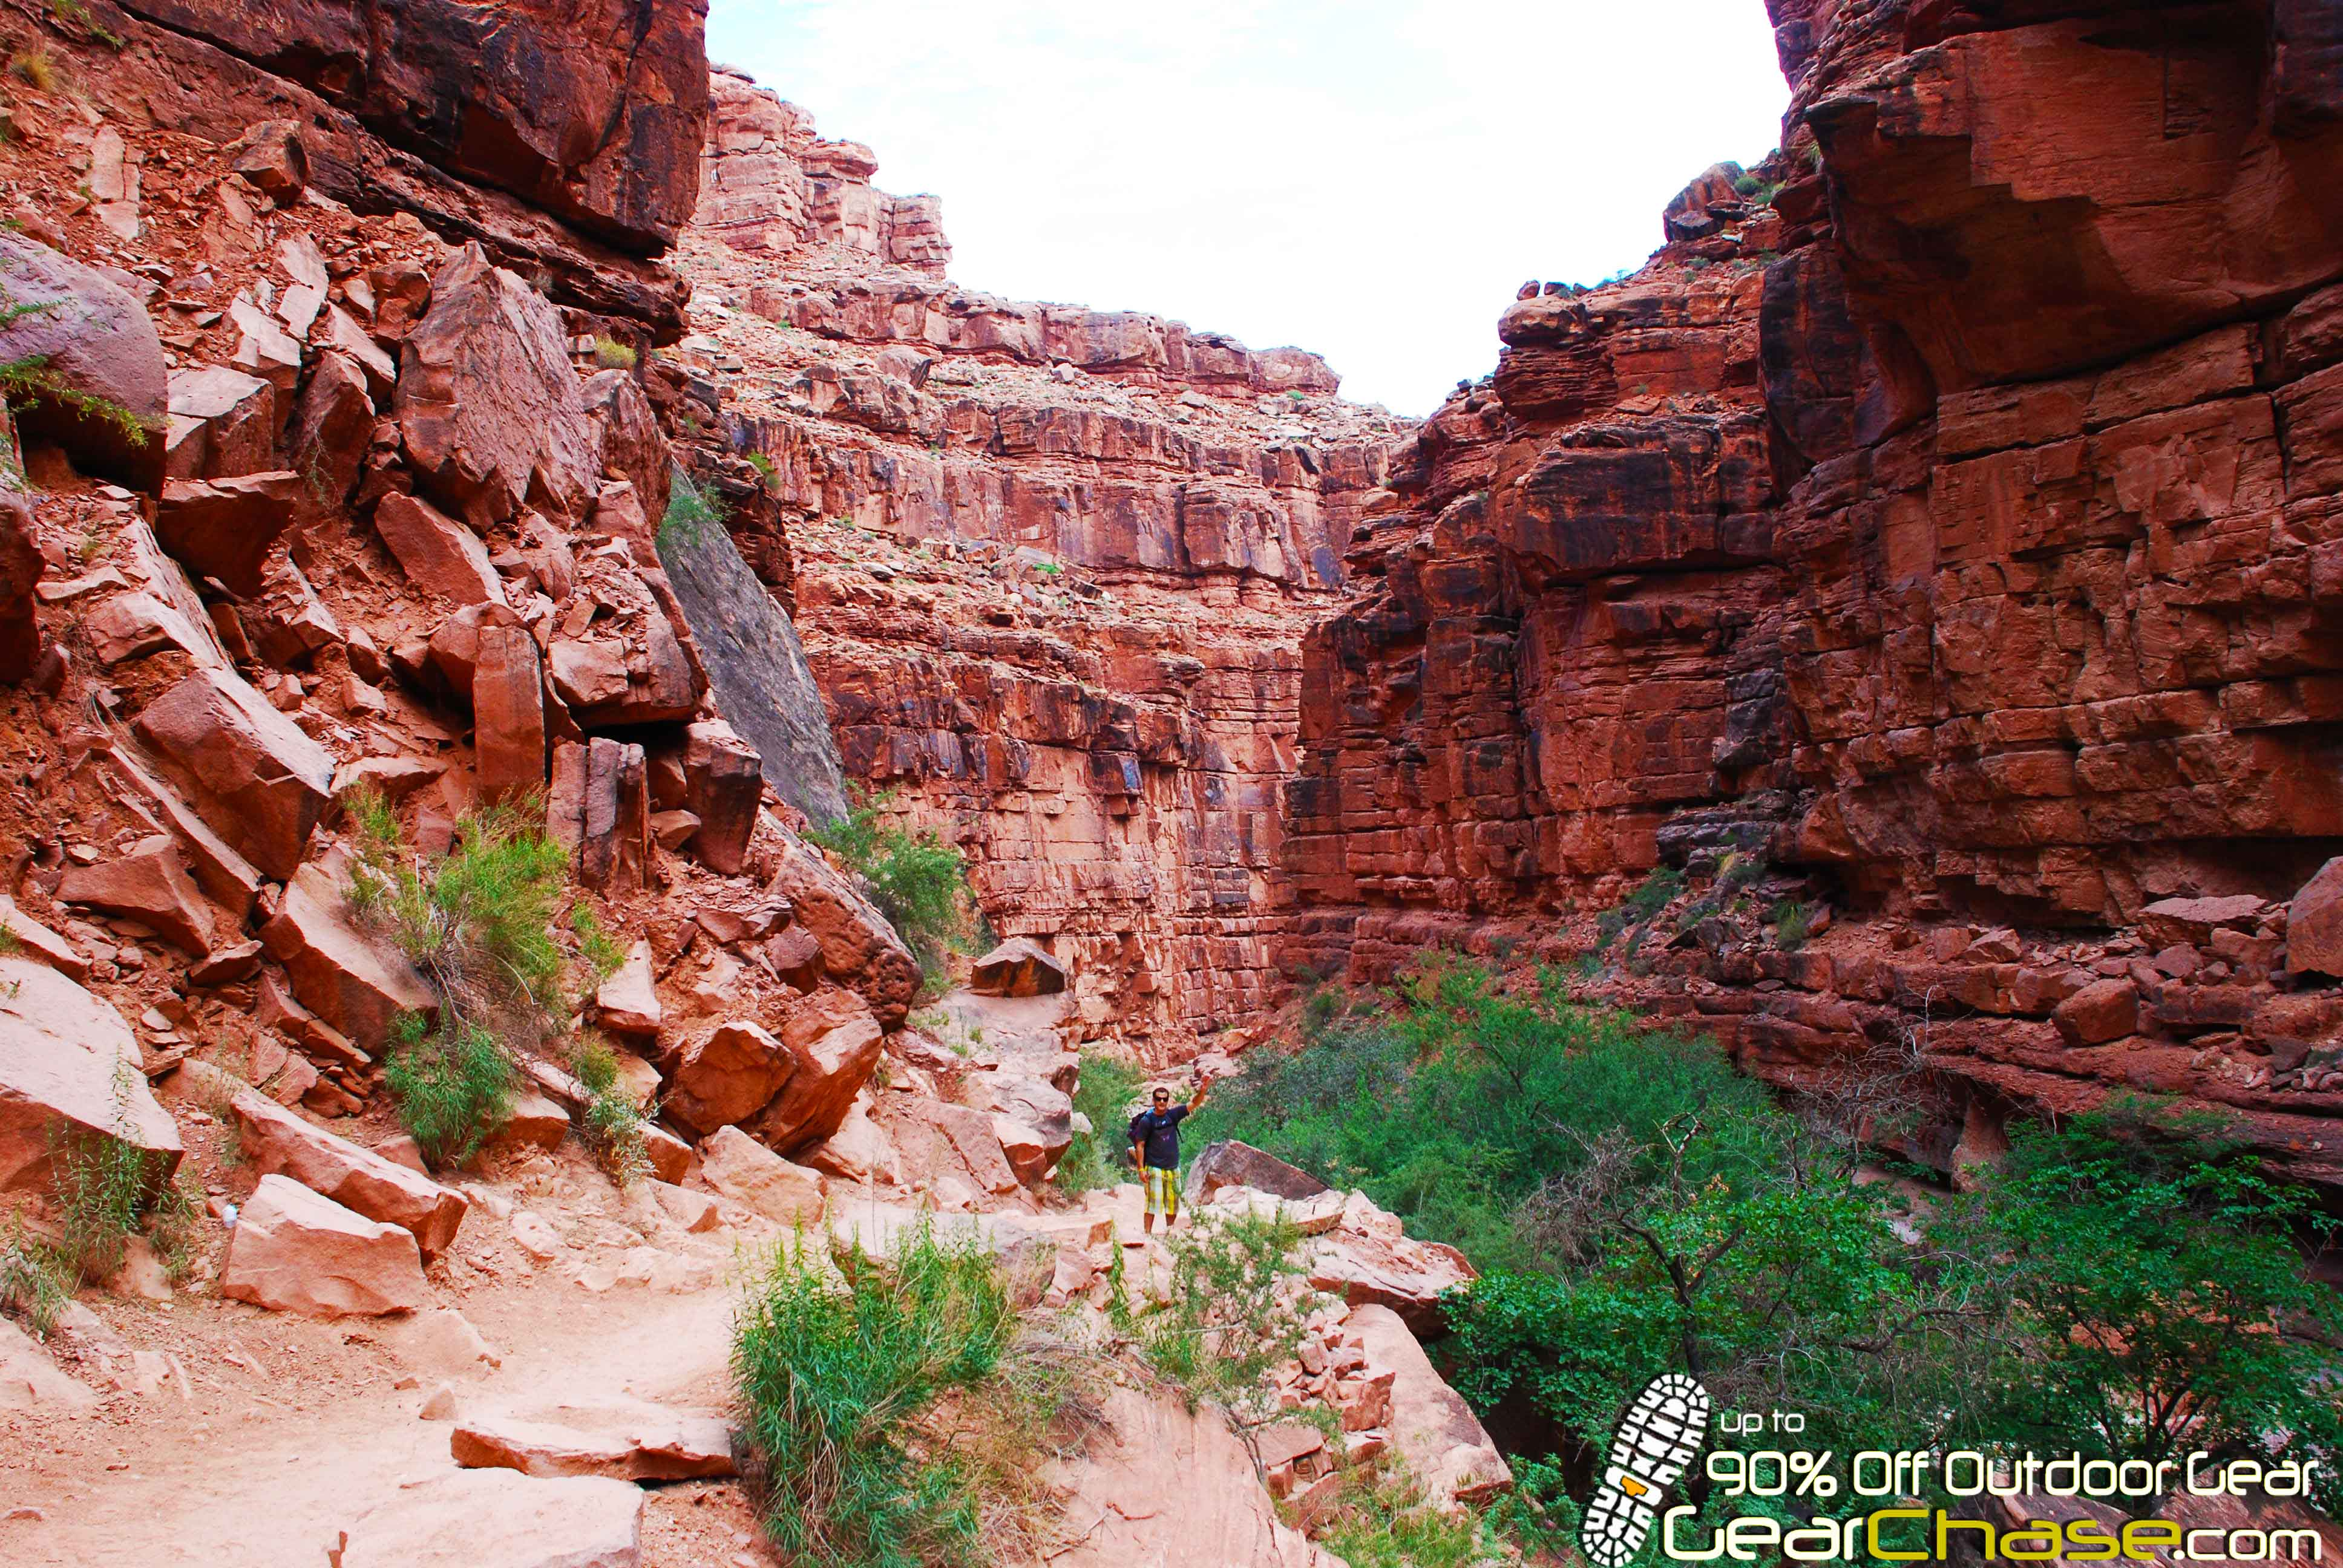 Hualapai Grand Canyon Bottom Trail